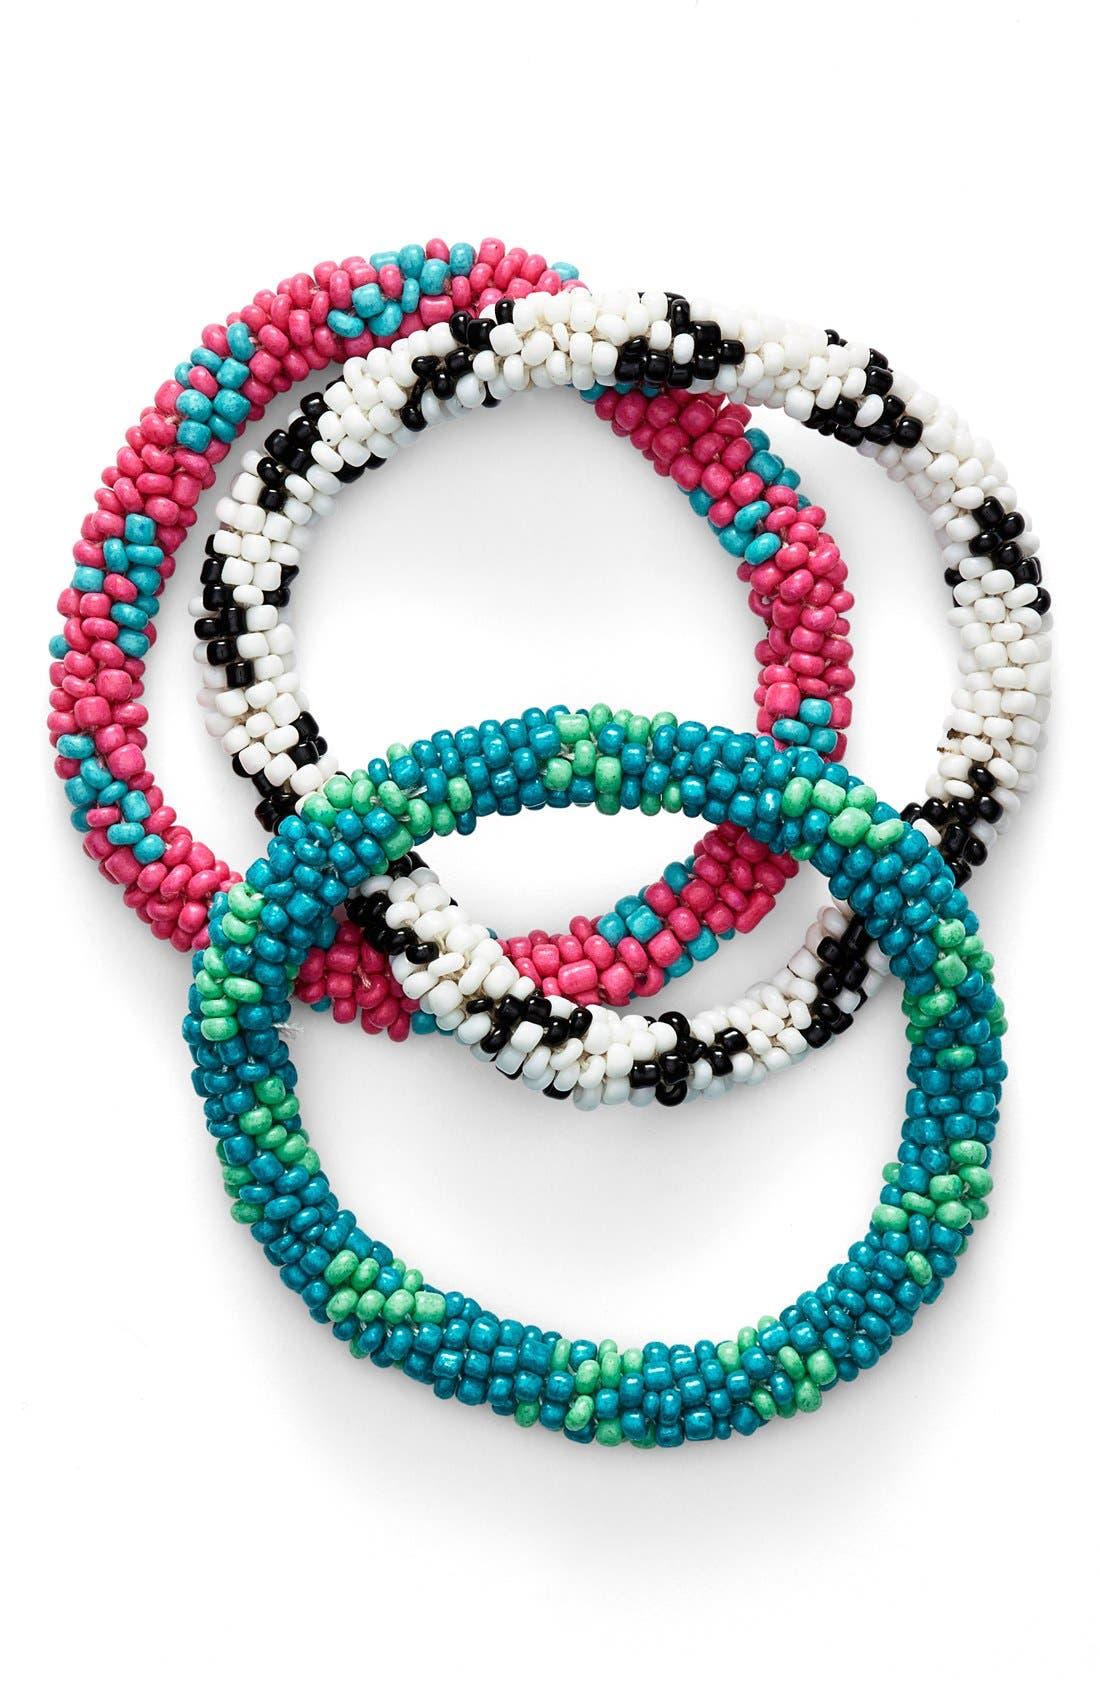 Main Image - Spring Street Stretch Bracelets (Set of 3)